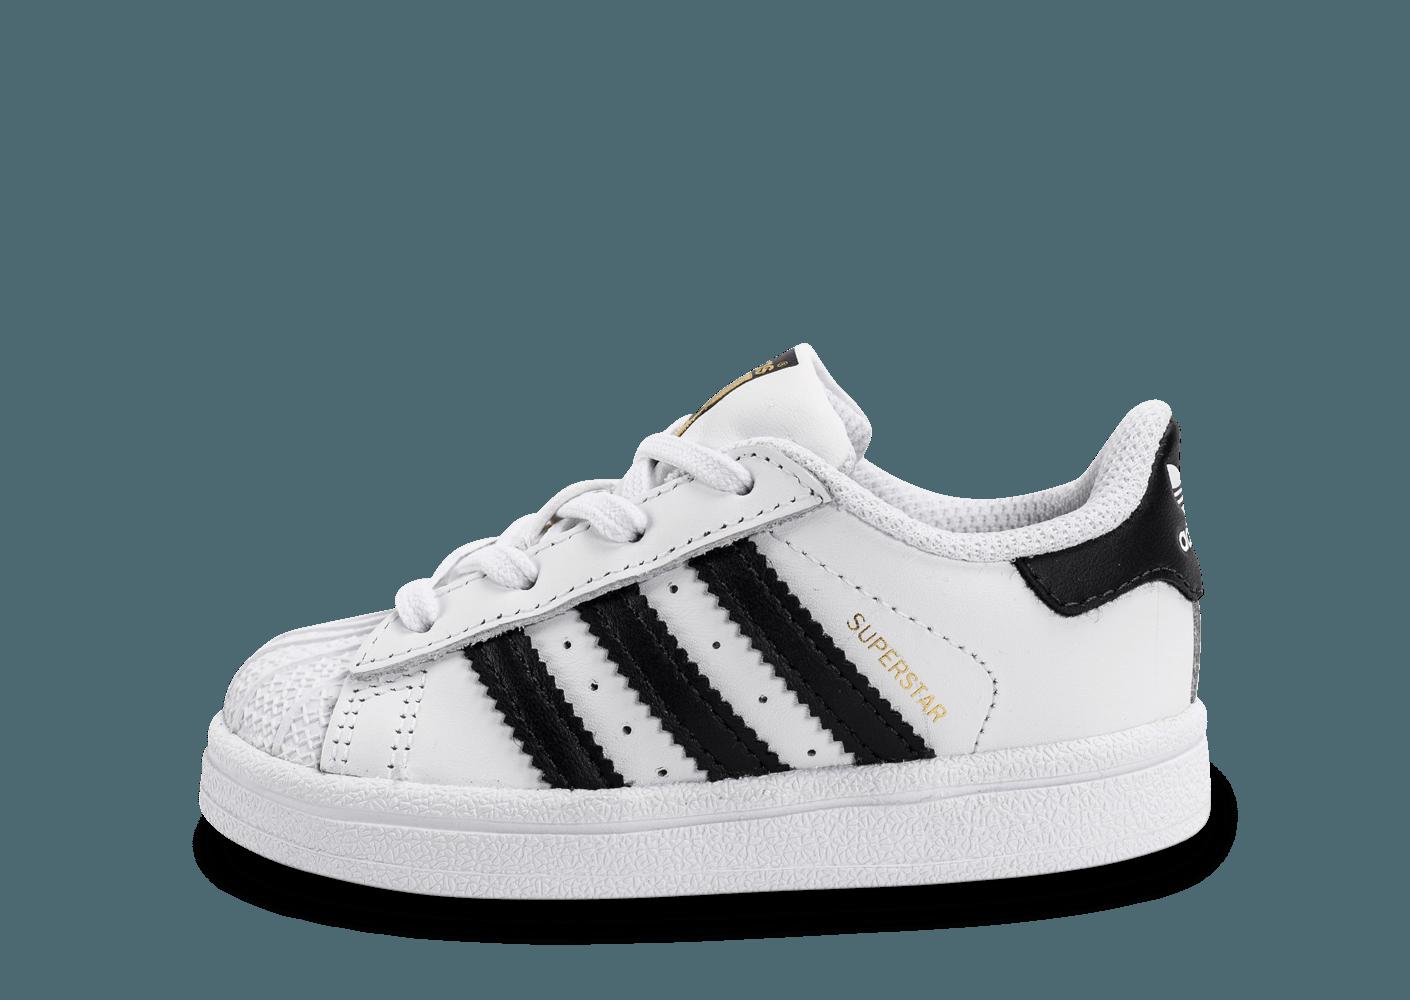 adidas superstar noir avec bande blanche